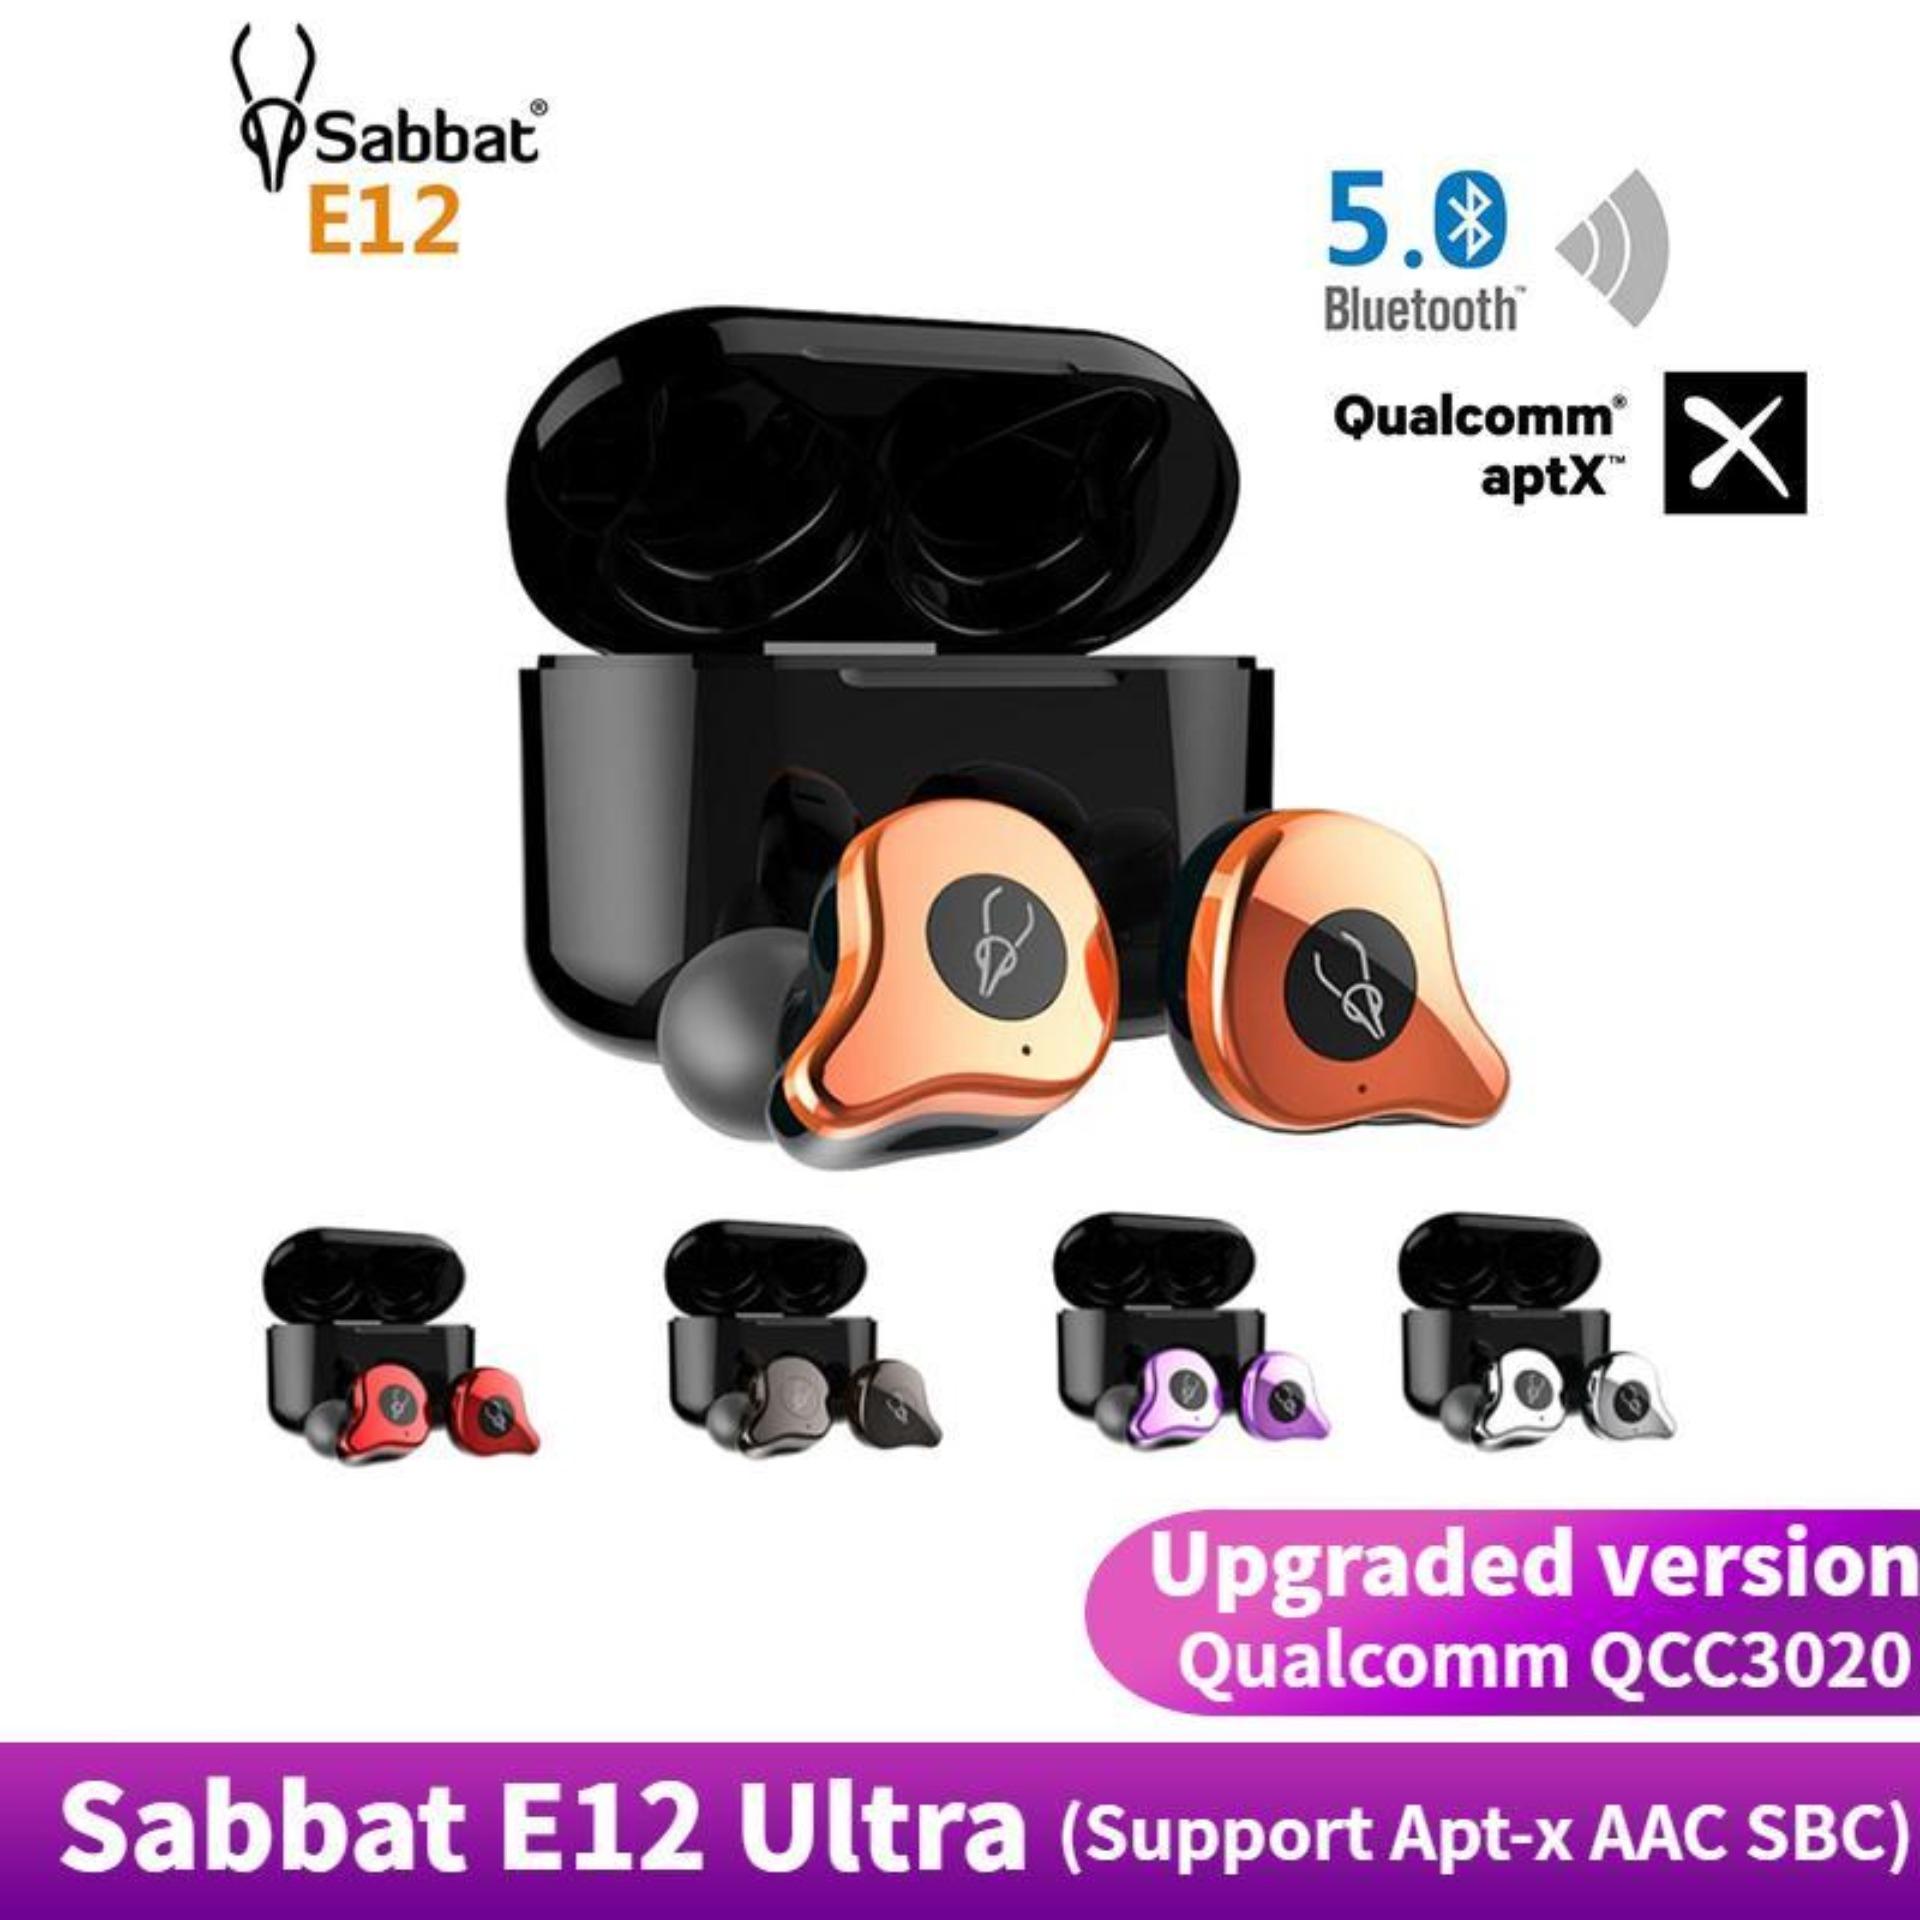 Original Sabbat E12 Ultra Qualcomm QCC3020 TWS Bluetooth 5.0 True Wireless earbuds Wireless Headset Wireless HiFi Monitor Noise Isolation Noise-canceling In Ear Running Sport Earphone Wireless Charging Box